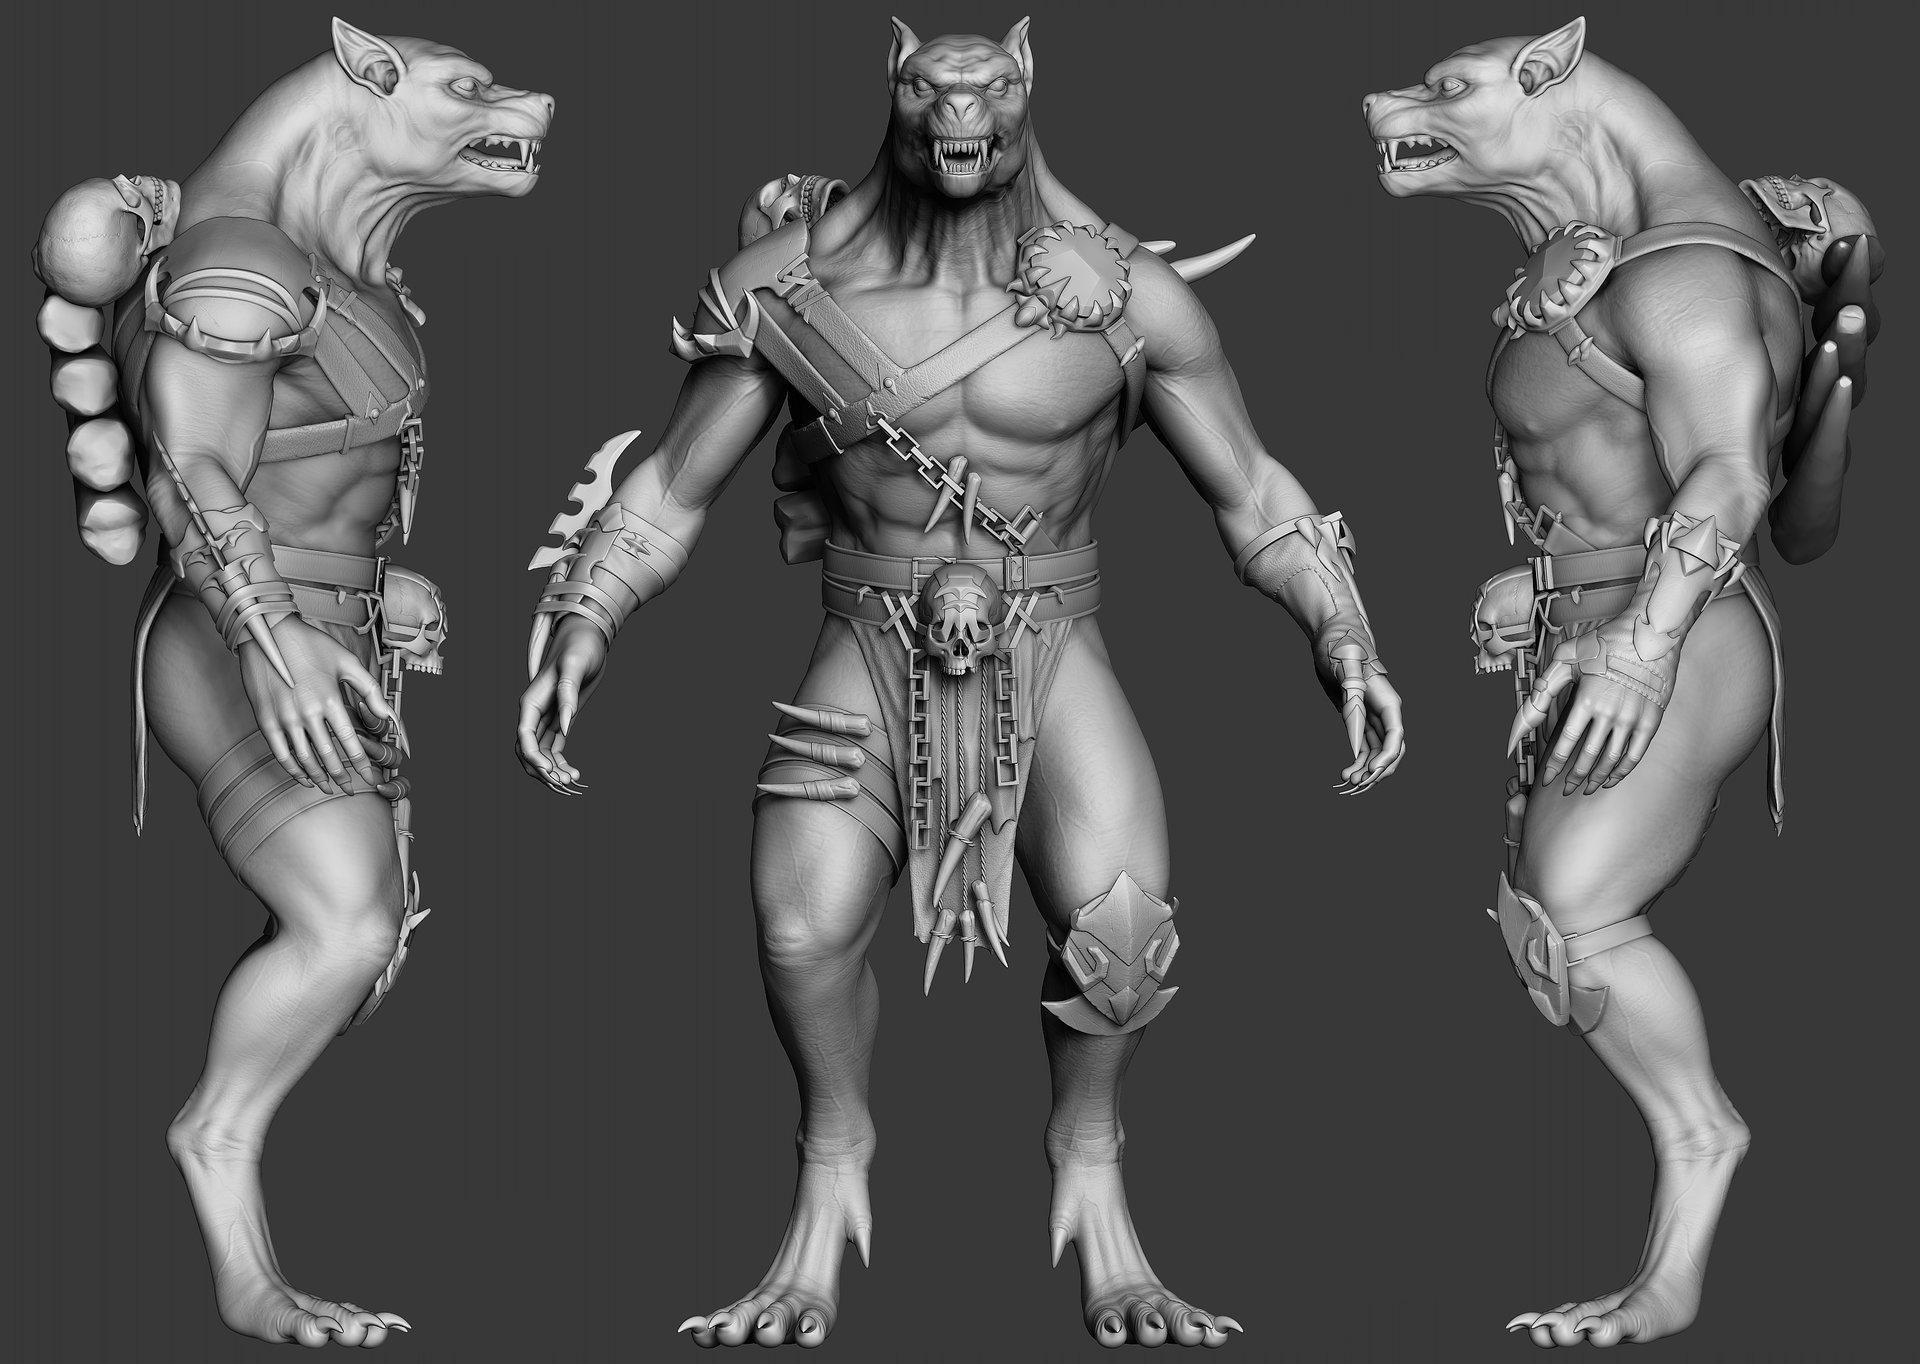 angel-bedolla-werewolf-work-in-progress-ortho.jpg?1435553291